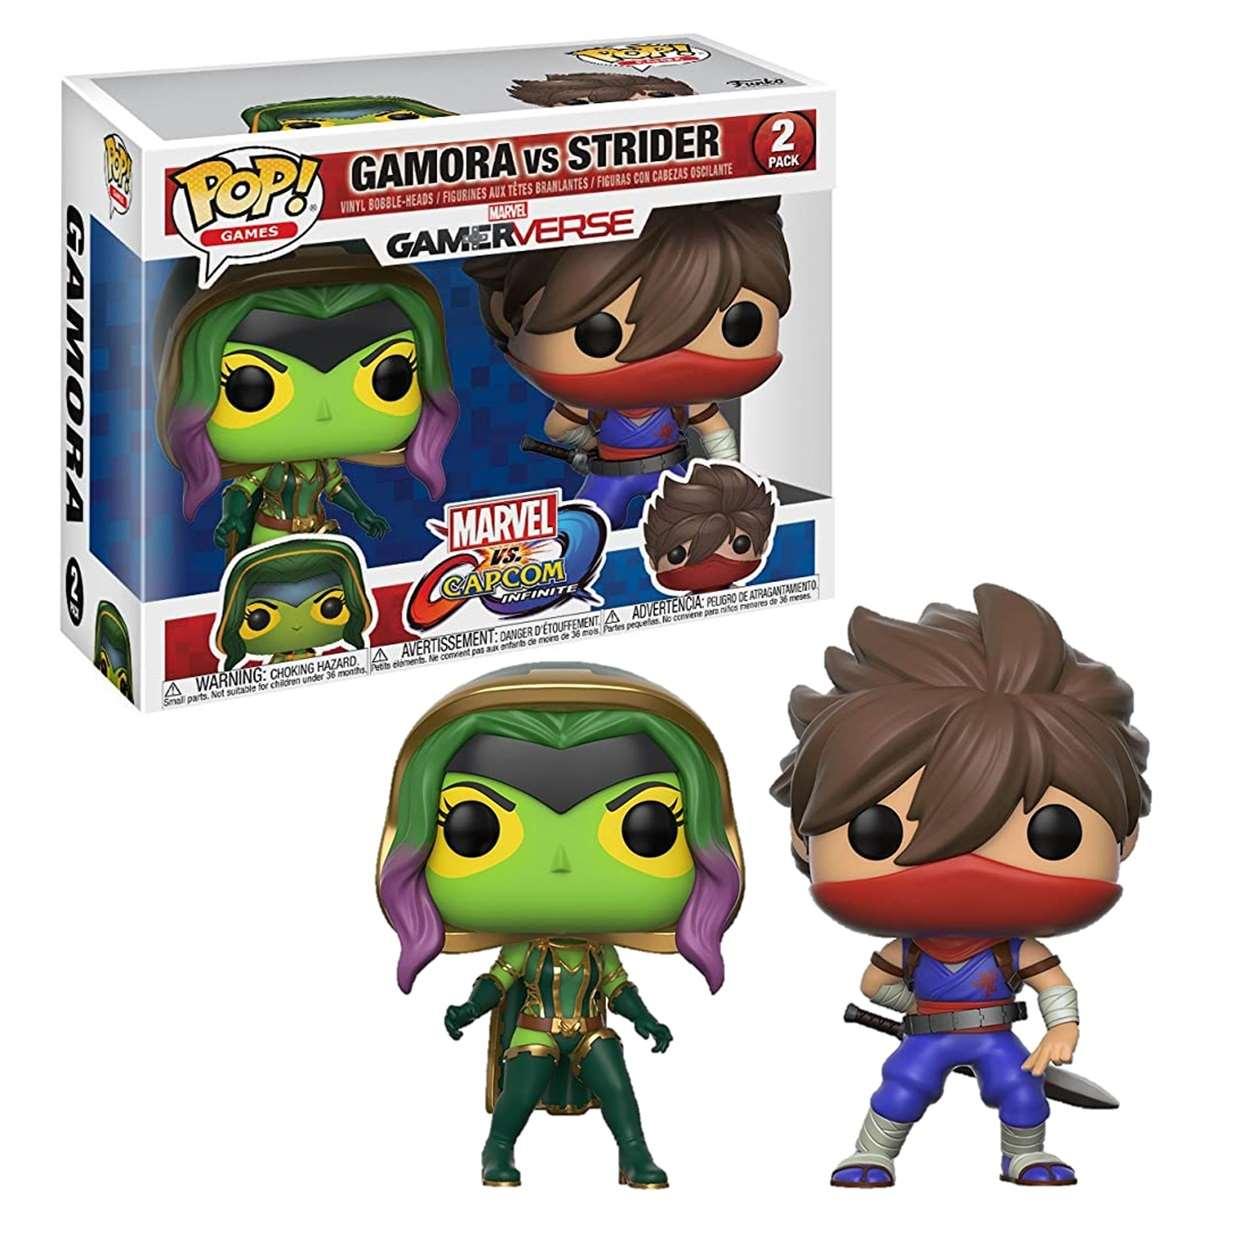 Gamora Vs Strider Pack 2 Figura Gamerverse Funko Pop!